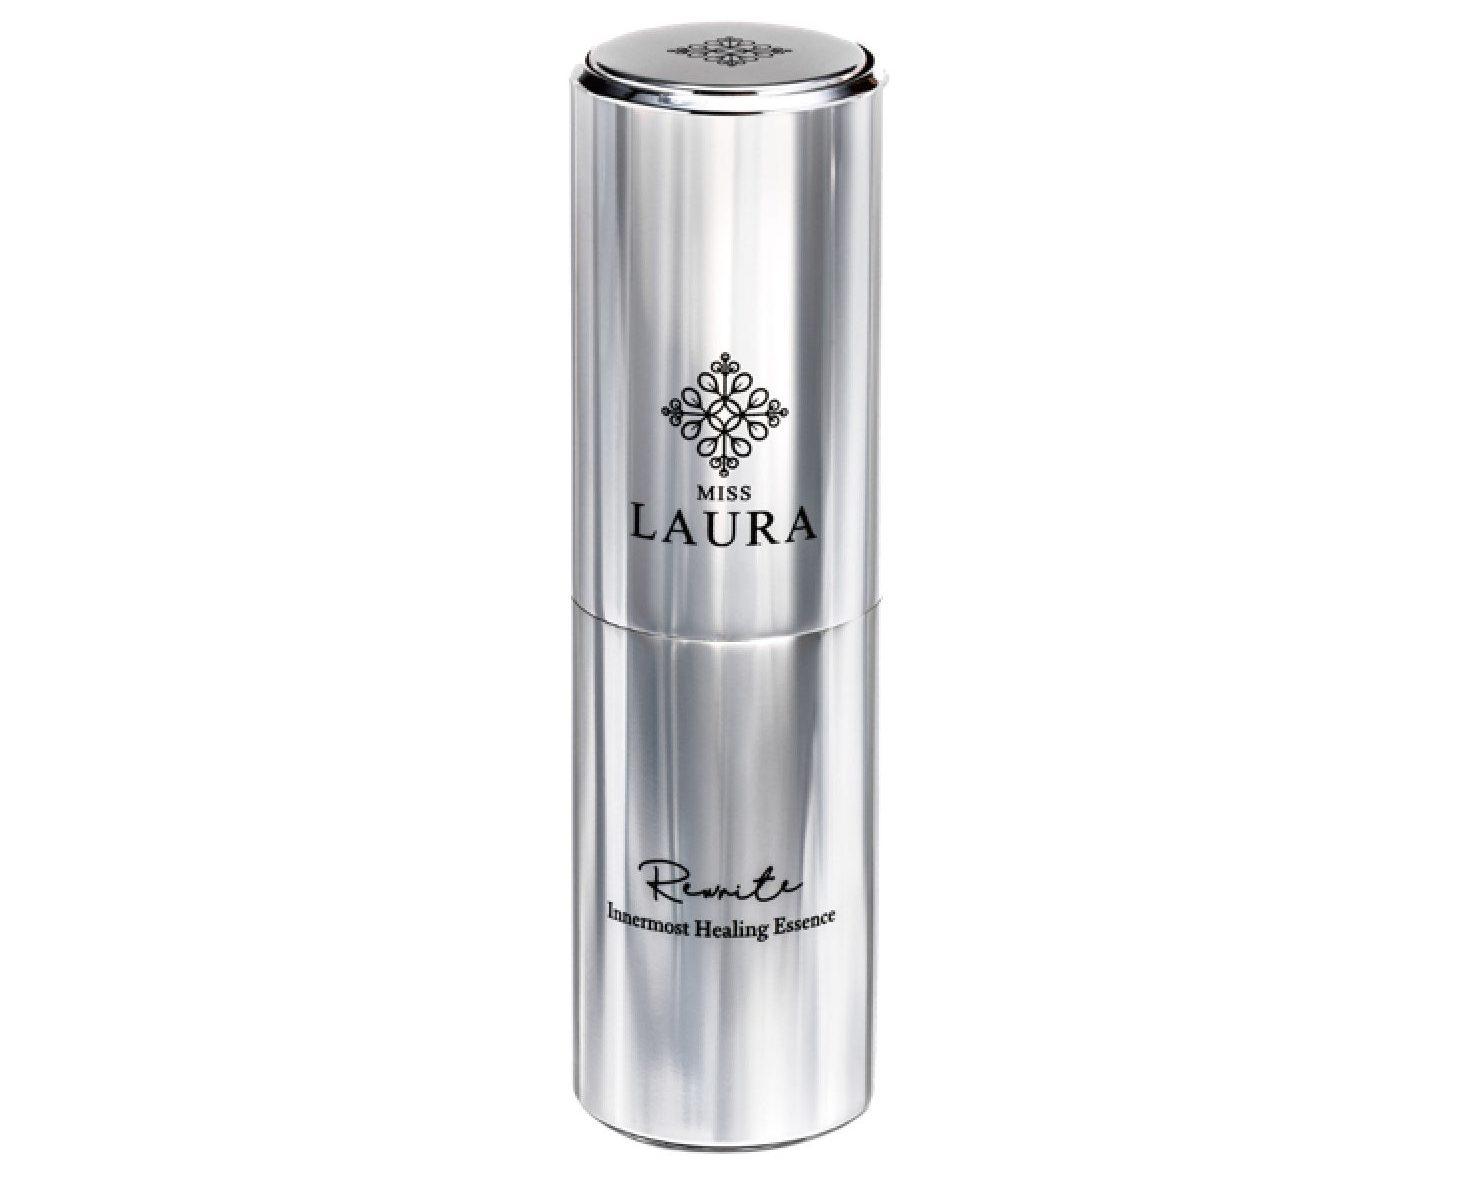 Rewrite deep hydration healing essence